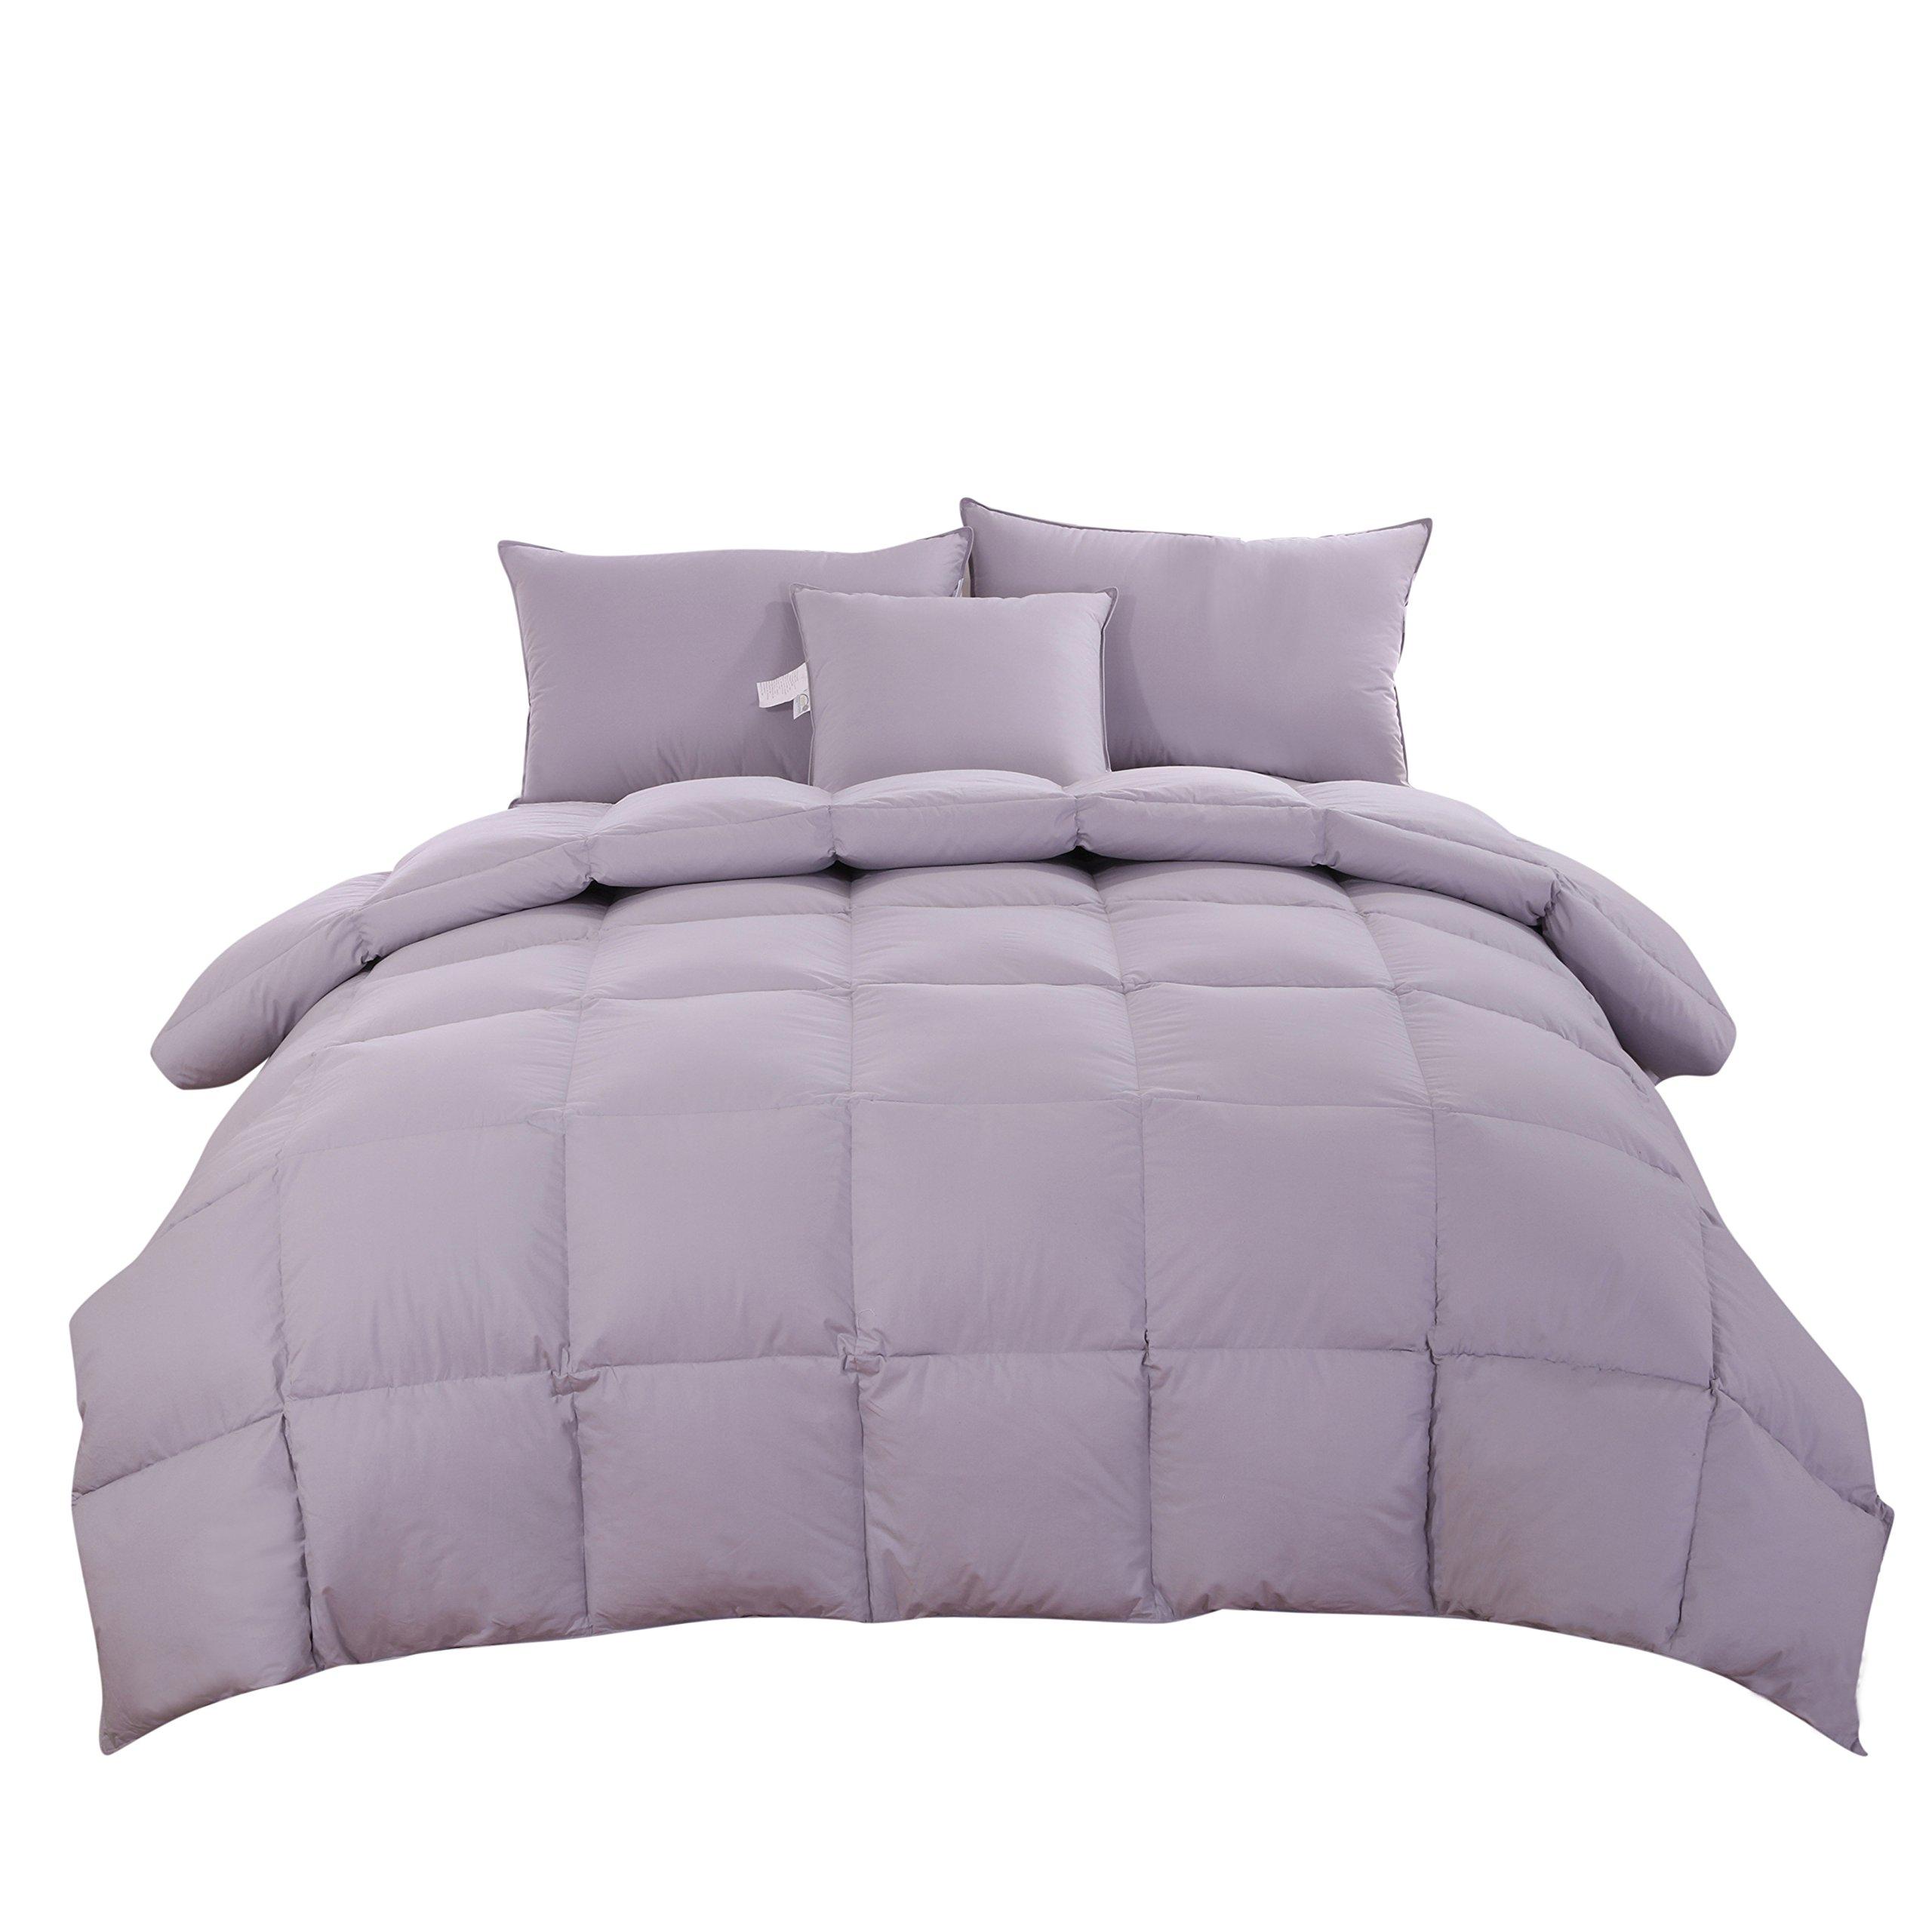 Unite Down BEST 90% GOOSE DOWN Grey Comforter/Duvet/Quilt For All Seasons, 100% Organic Cotton 800TC, 850+ Filling Power, Durable, Grey Full